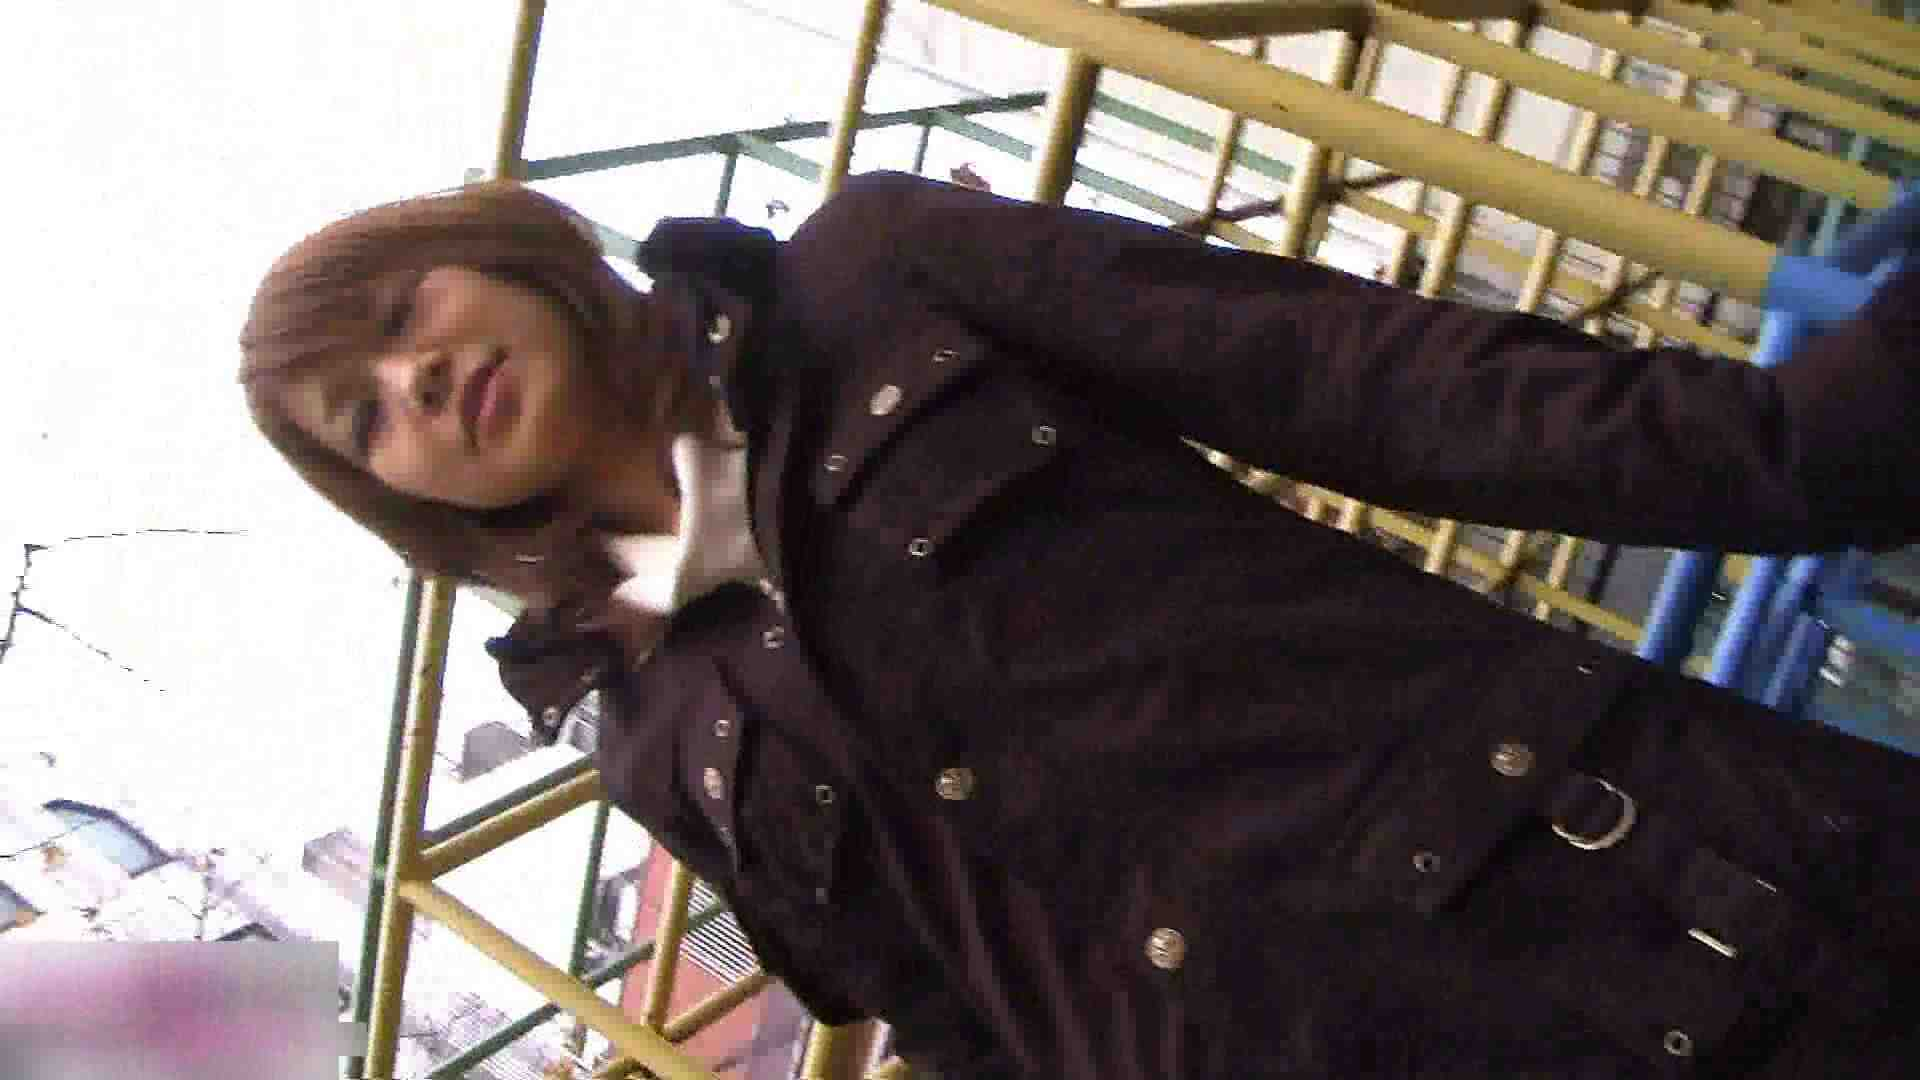 S級厳選美女ビッチガールVol.05 美女丸裸 ヌード画像 76pic 2